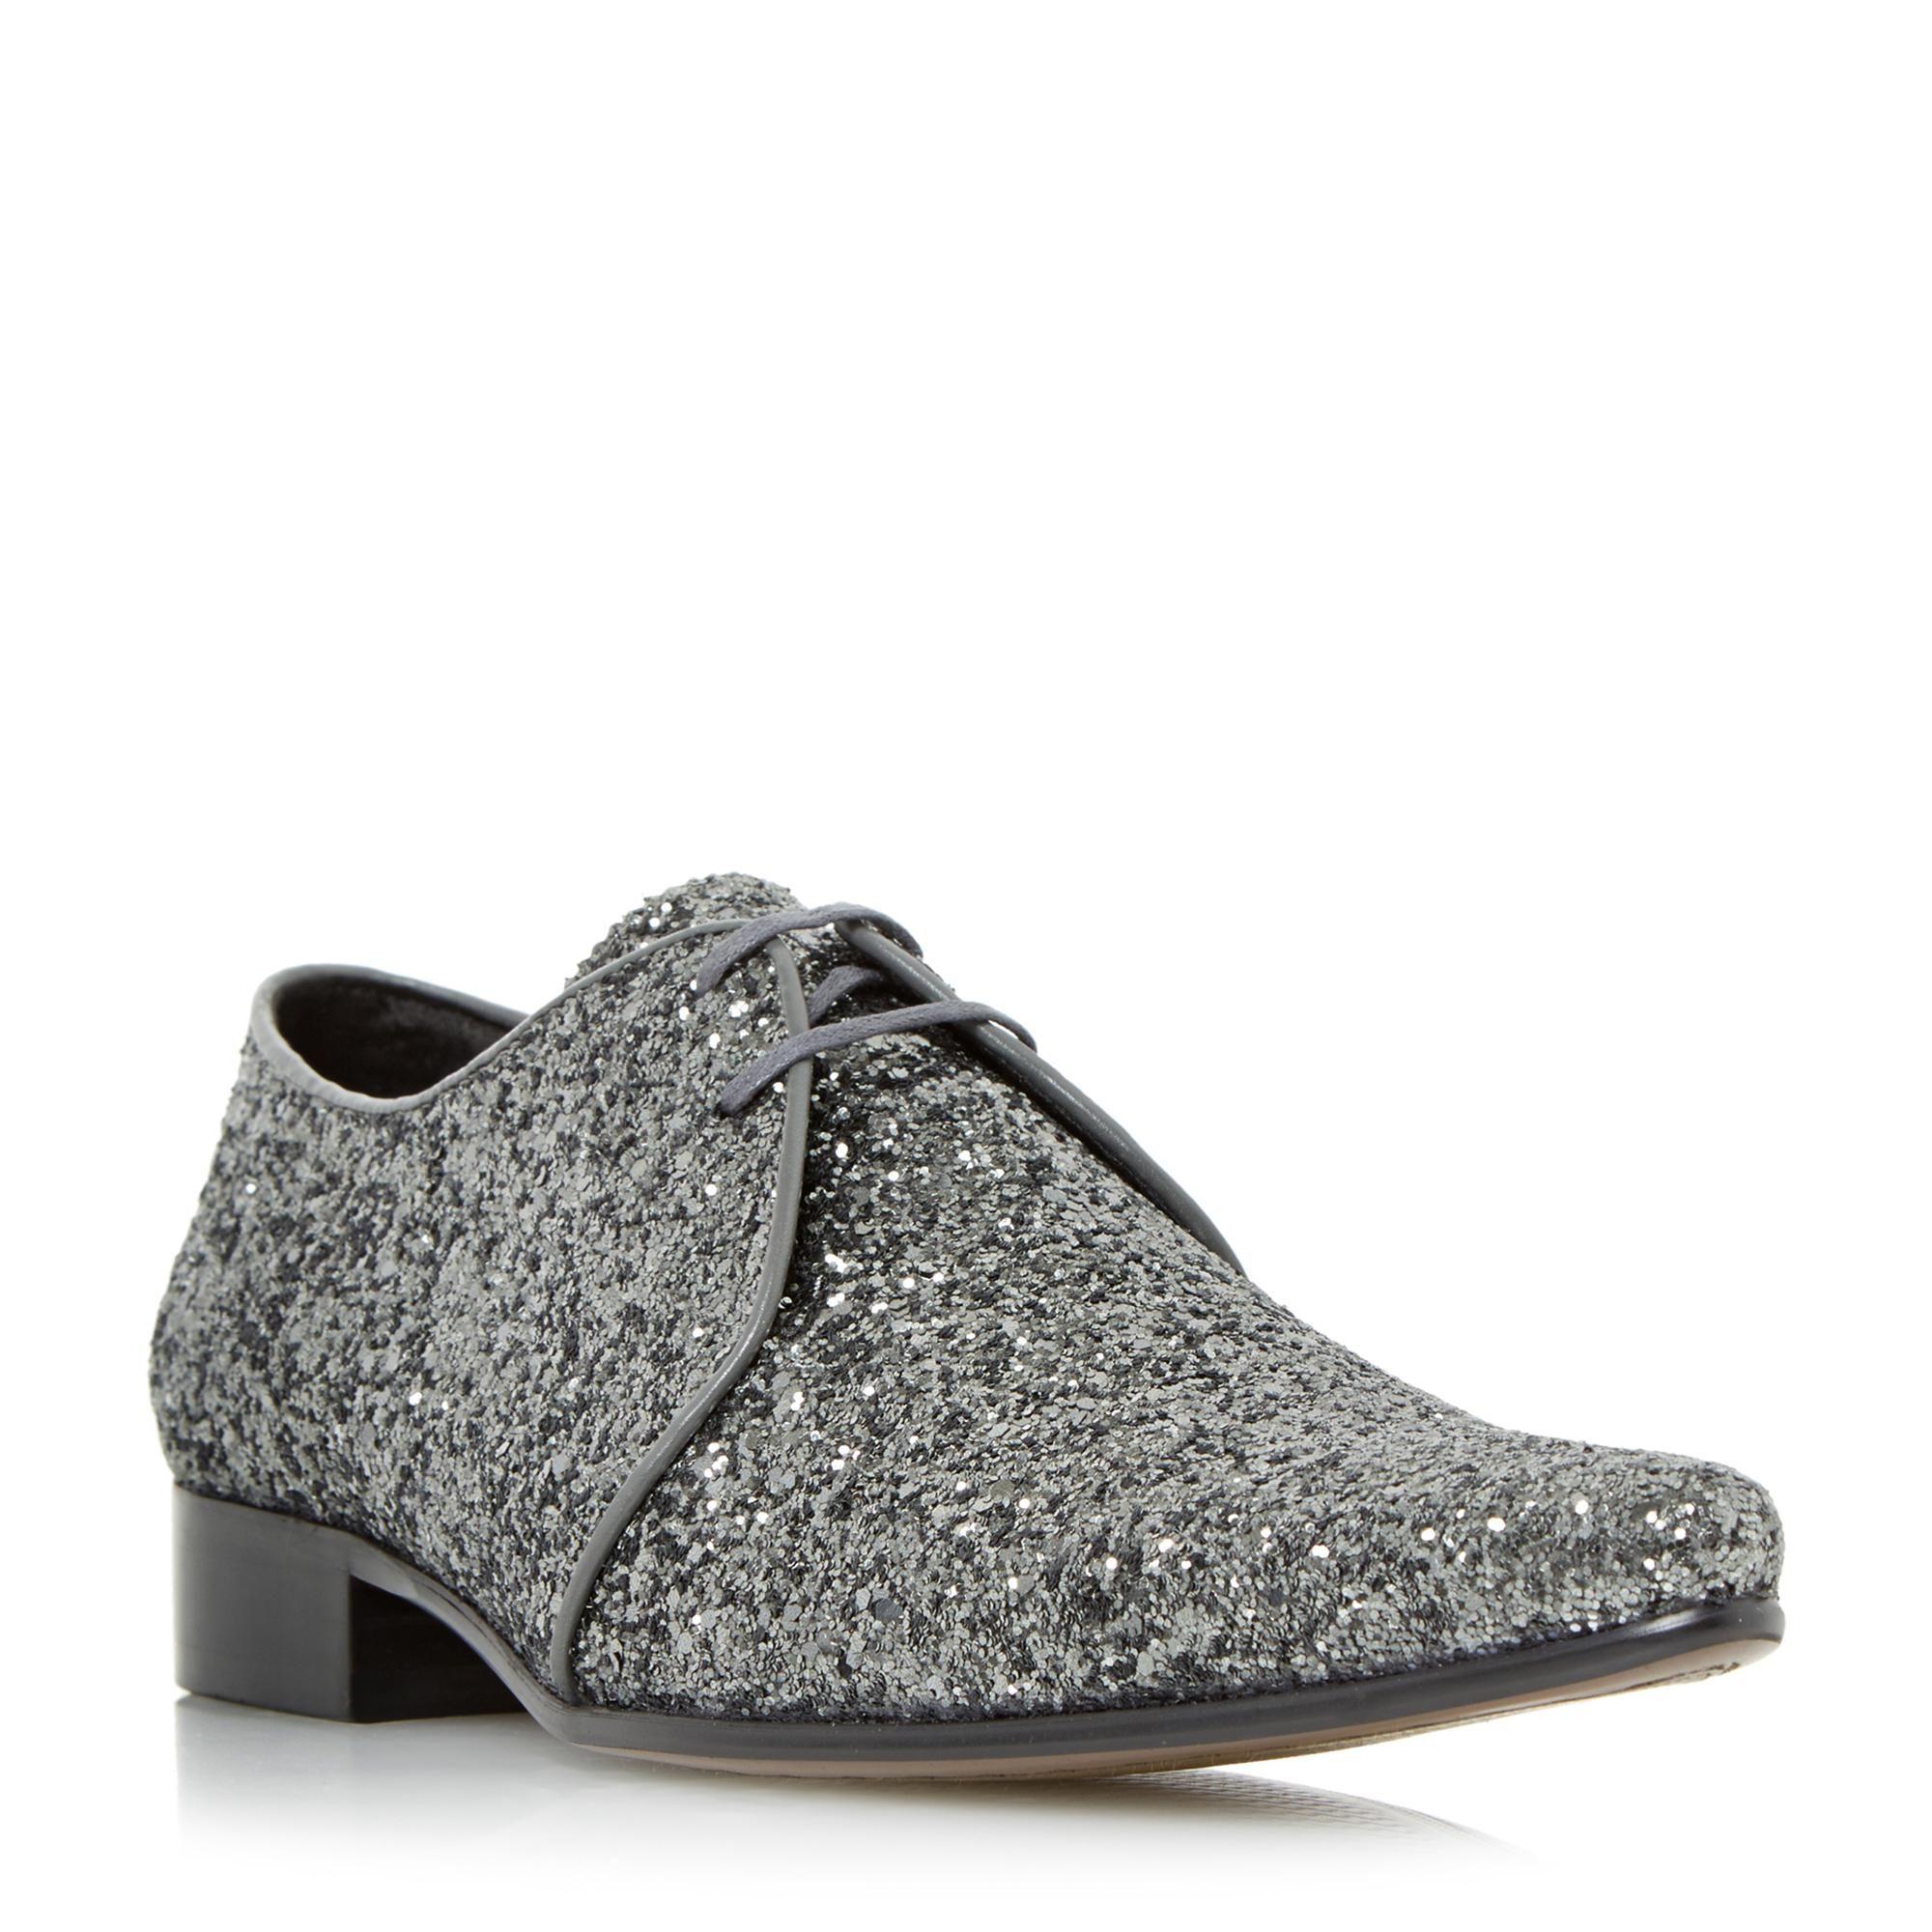 b48edb2ac3e4 DUNE MENS RICKY M - Glitter Derby Shoe - silver